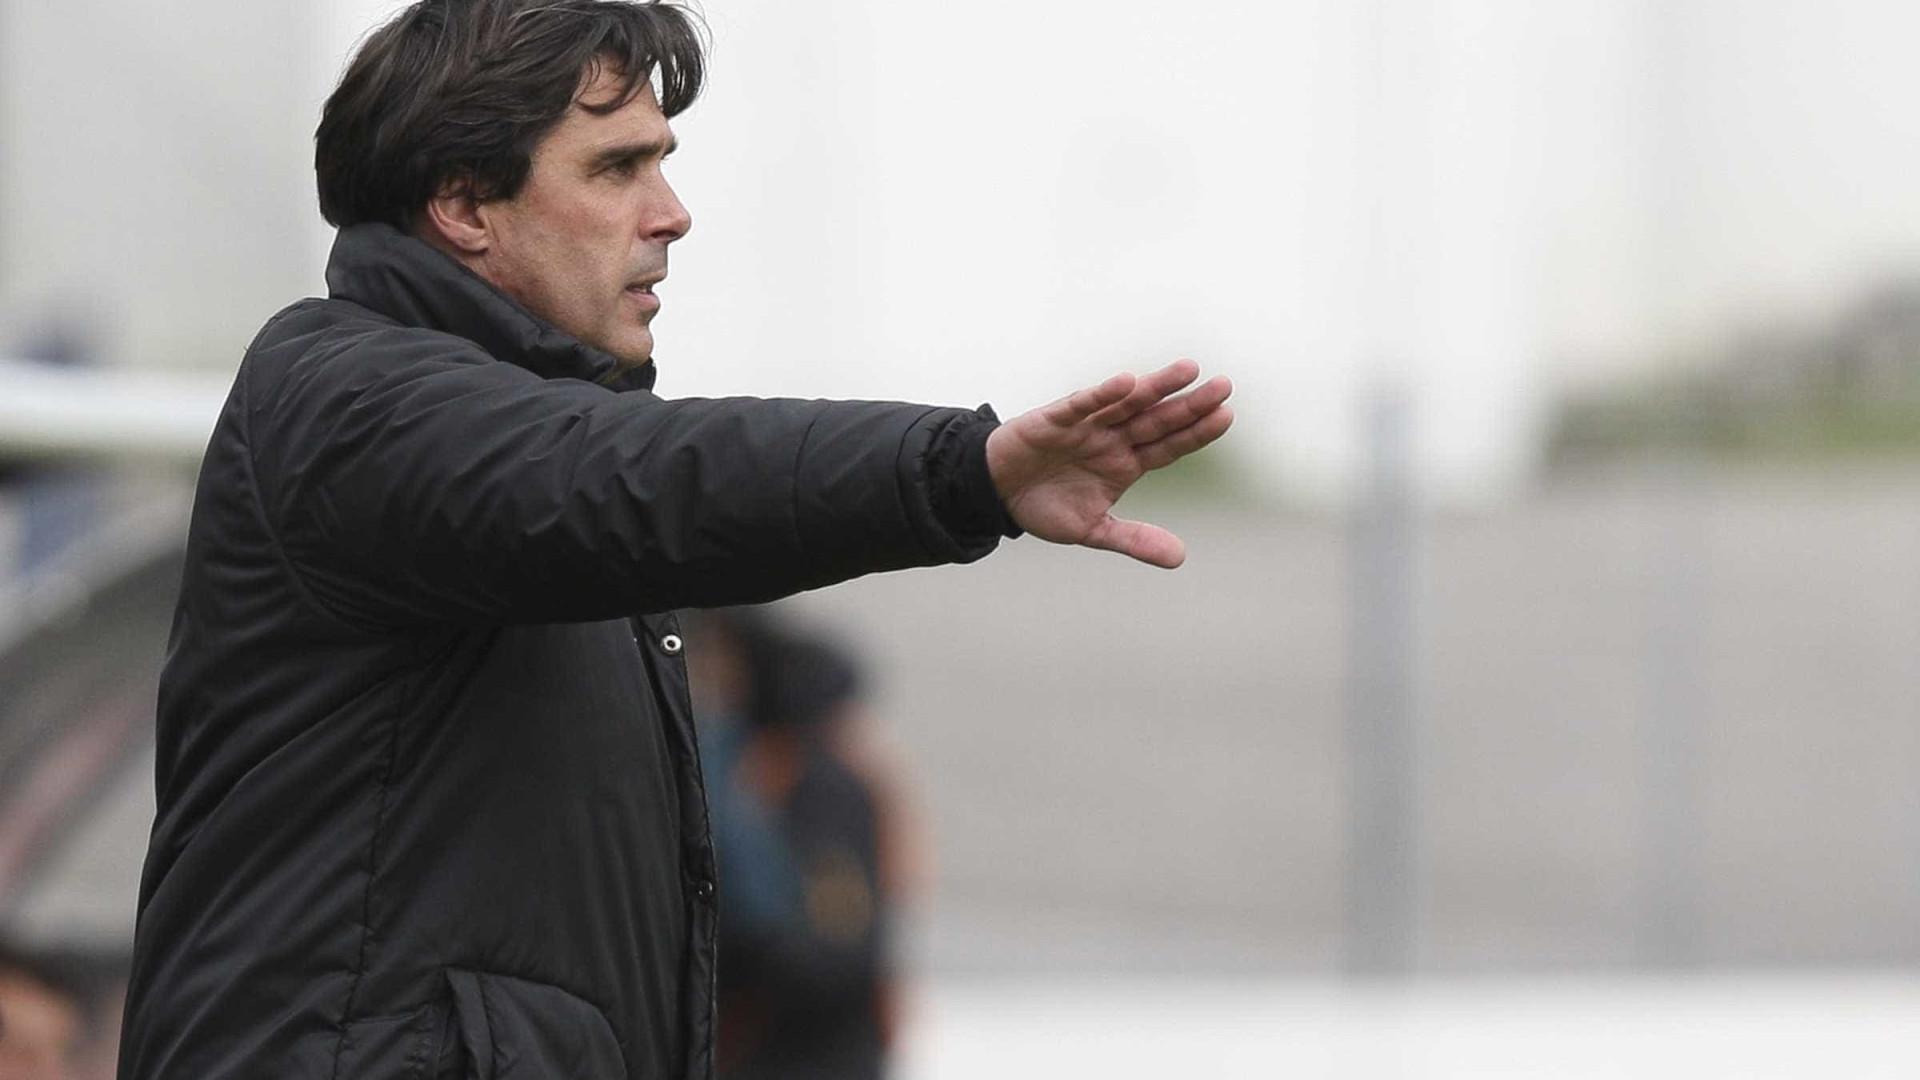 Treinador do Marítimo ambiciona grupo focado para vencer o Belenenses